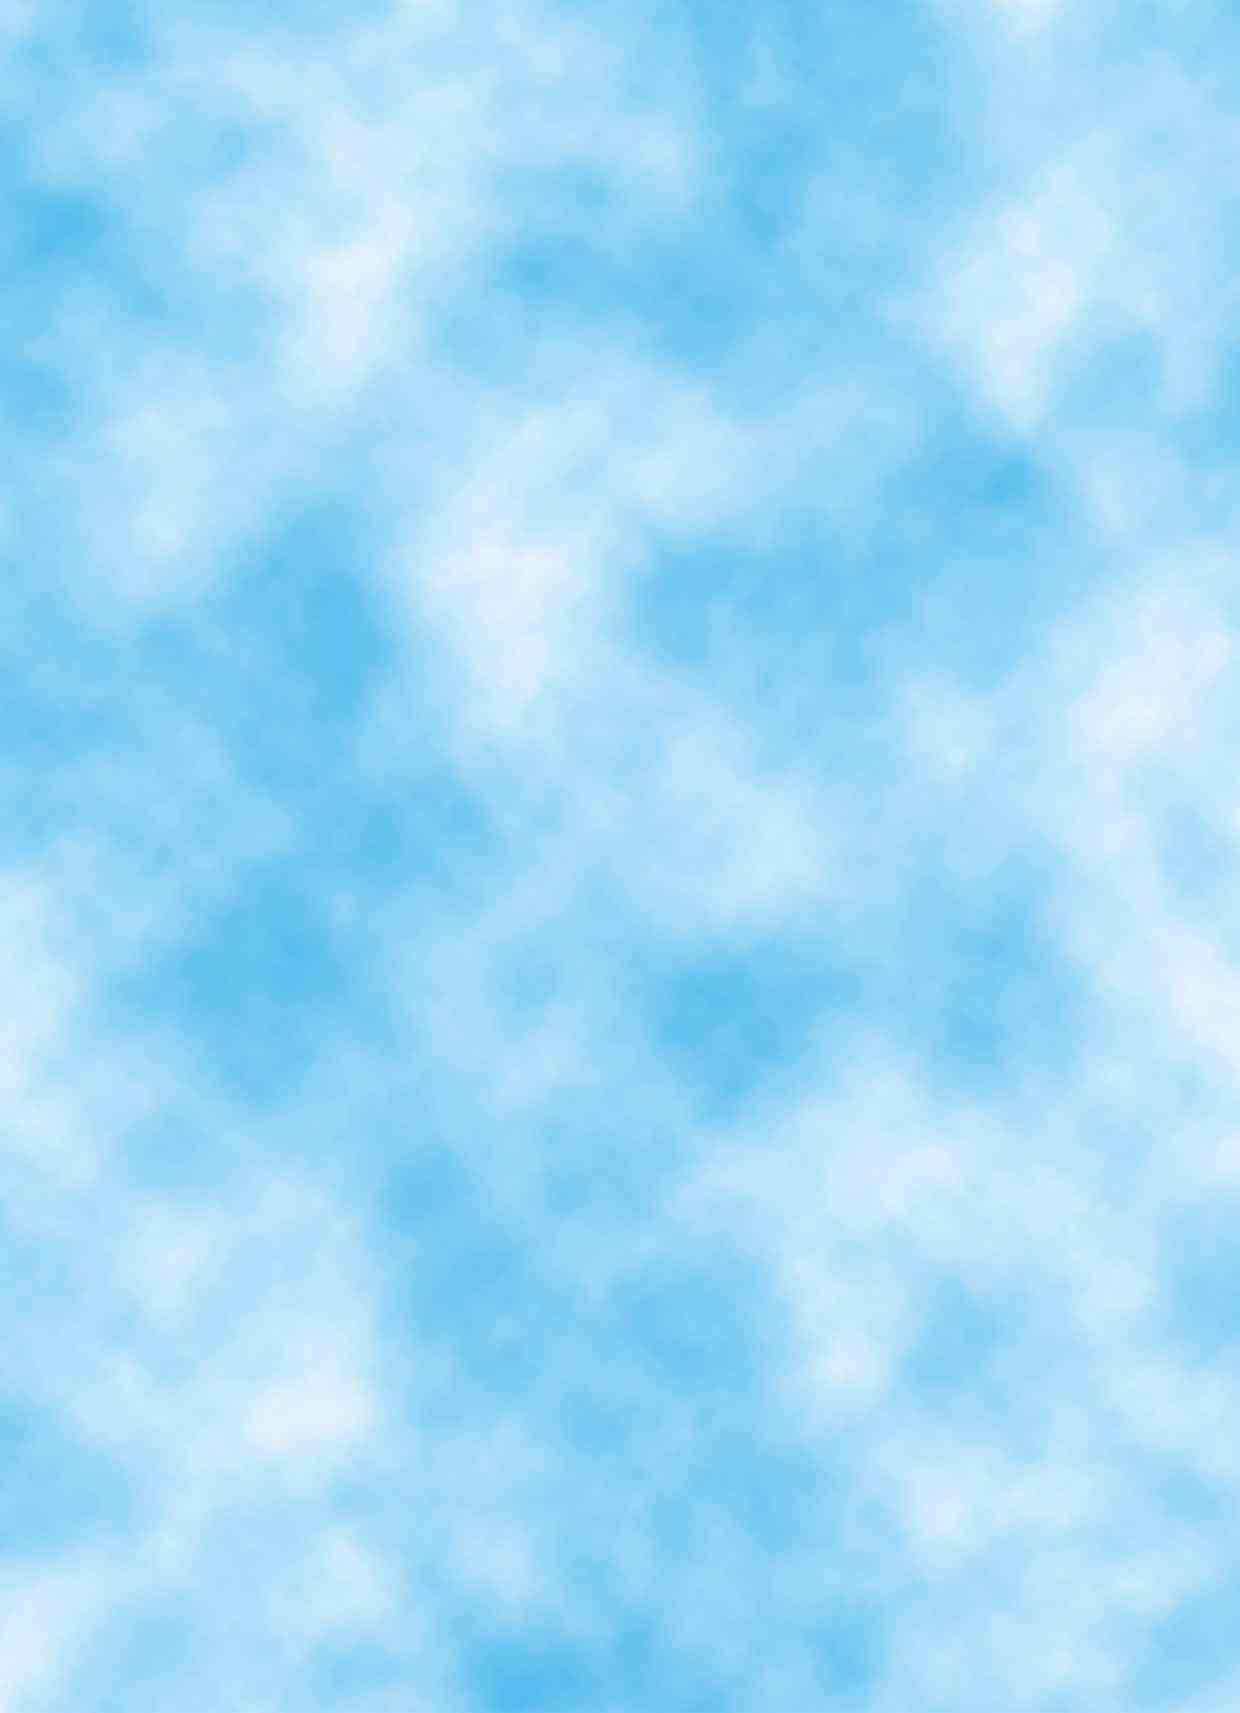 1240x1713px baby blue wallpaper tumblr wallpapersafari. Black Bedroom Furniture Sets. Home Design Ideas